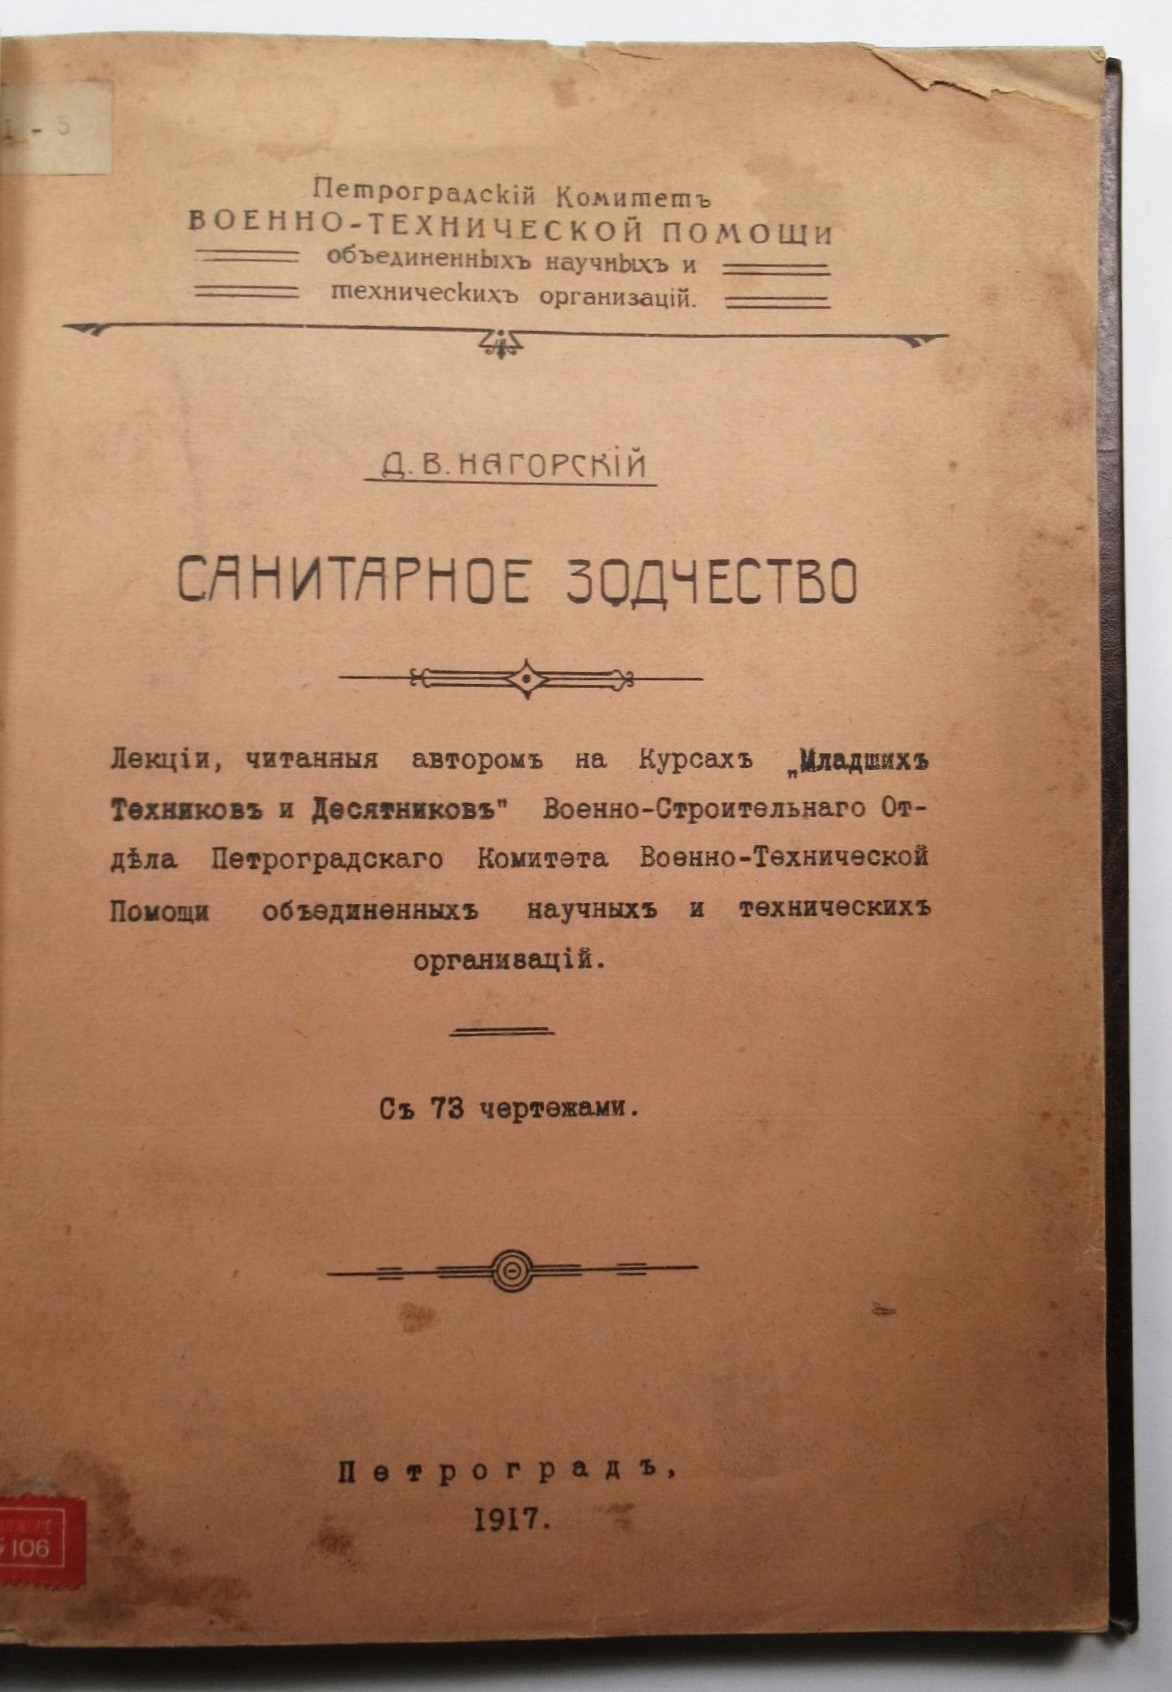 Wojskowe budownictwo sanitarne Nagorsky ROSJA 1917